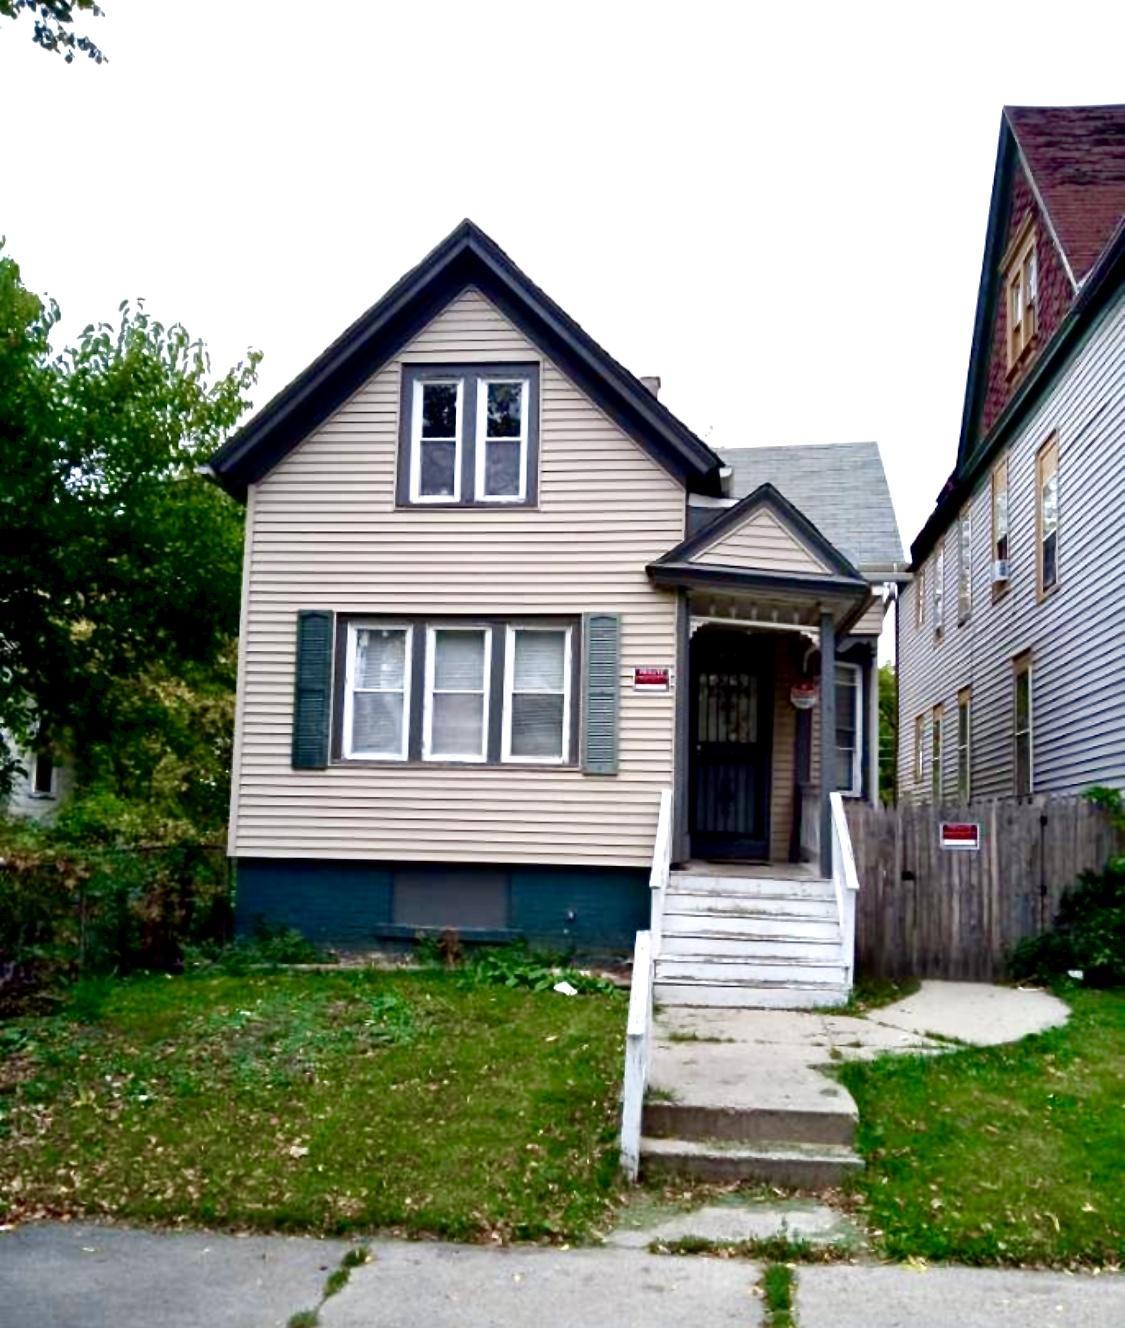 2468 Vine St, Milwaukee, Wisconsin 53205, 4 Bedrooms Bedrooms, 7 Rooms Rooms,1 BathroomBathrooms,Single-family,For Sale,Vine St,1714349